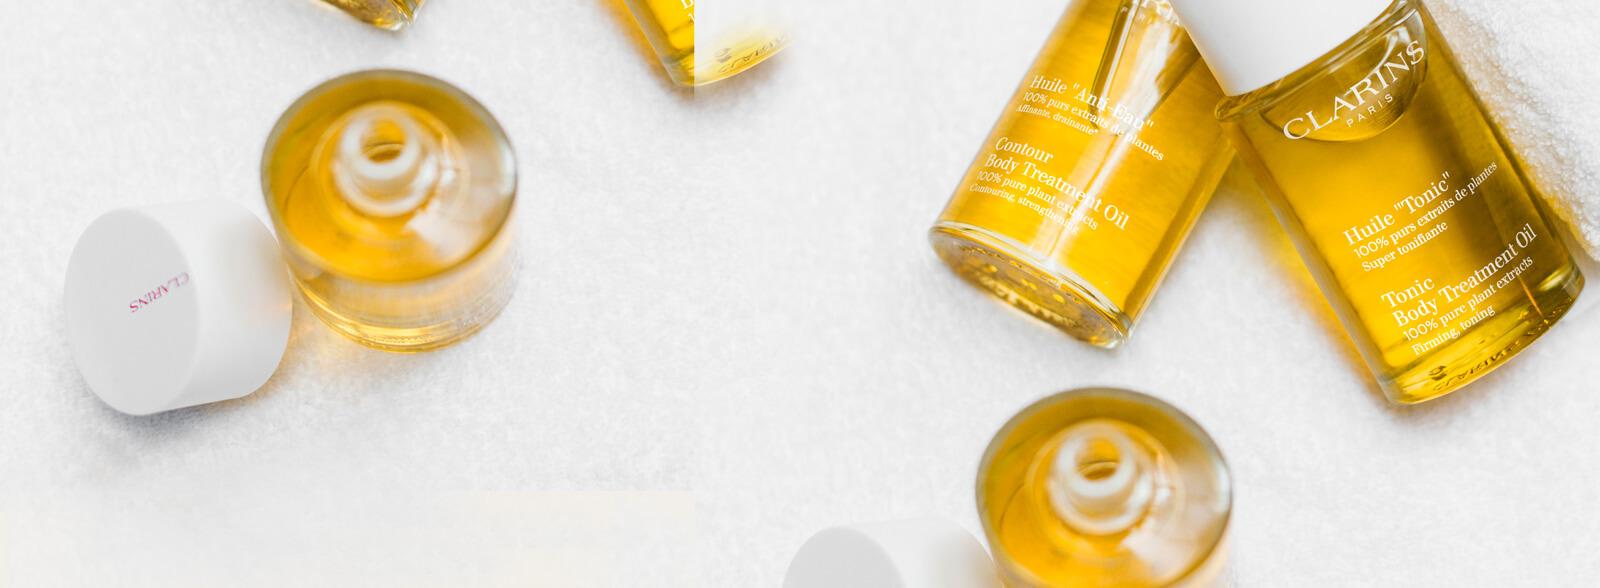 Clarins Oils